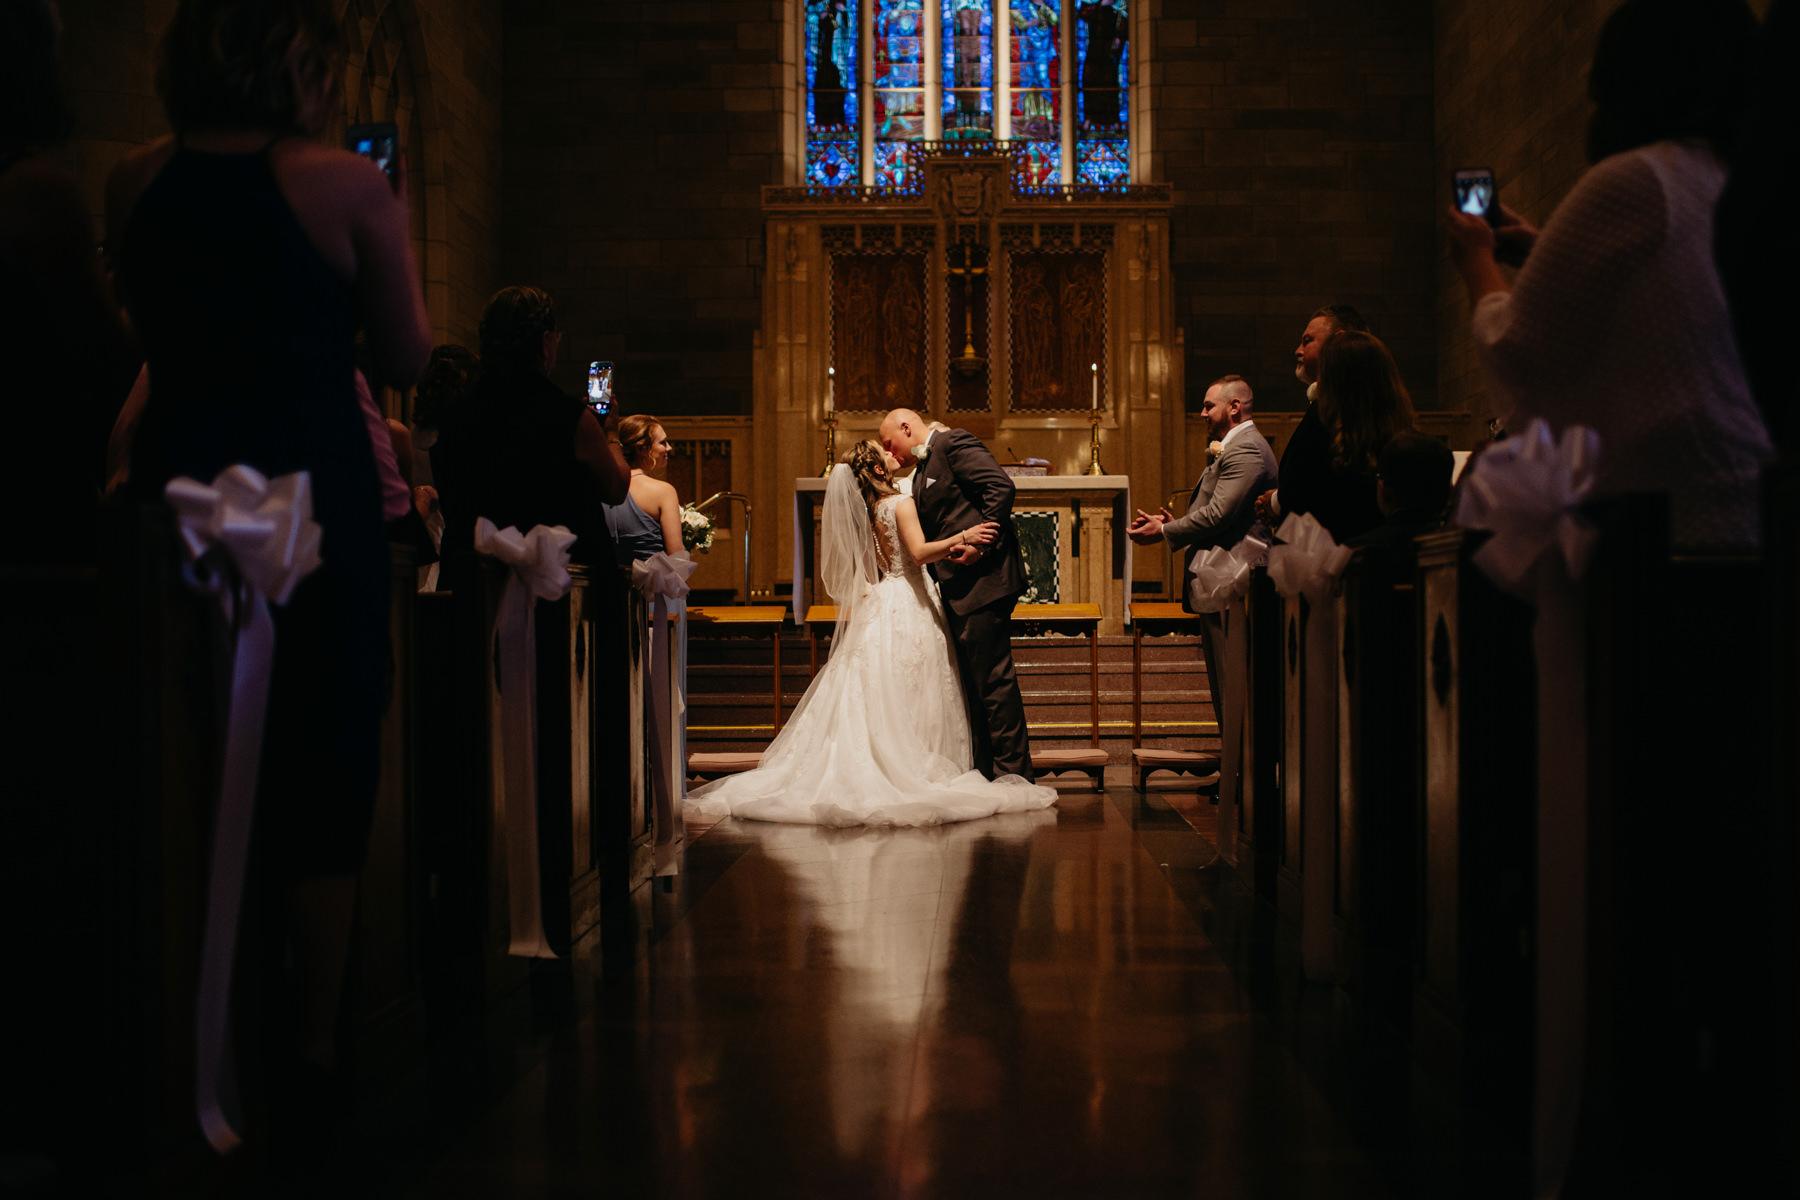 Quincy Ma Massachusetts Wedding Dedham Boston Granie Links Wedding New England Catholic Cathedral Liz Osban Photography 53.jpg